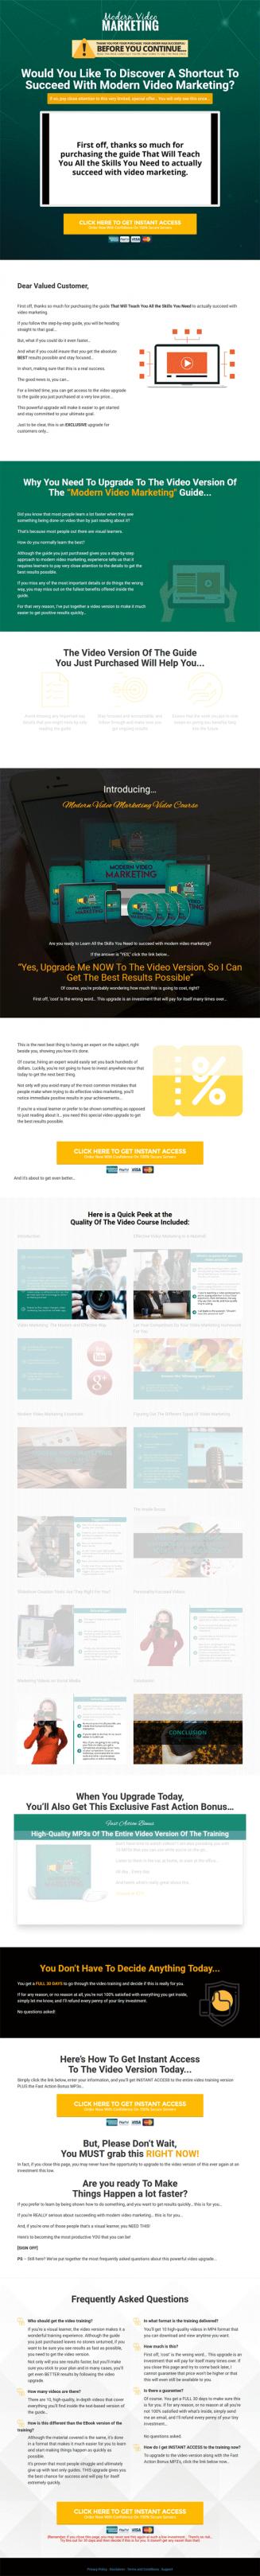 Modern Video Marketing Ebook and Videos MRR